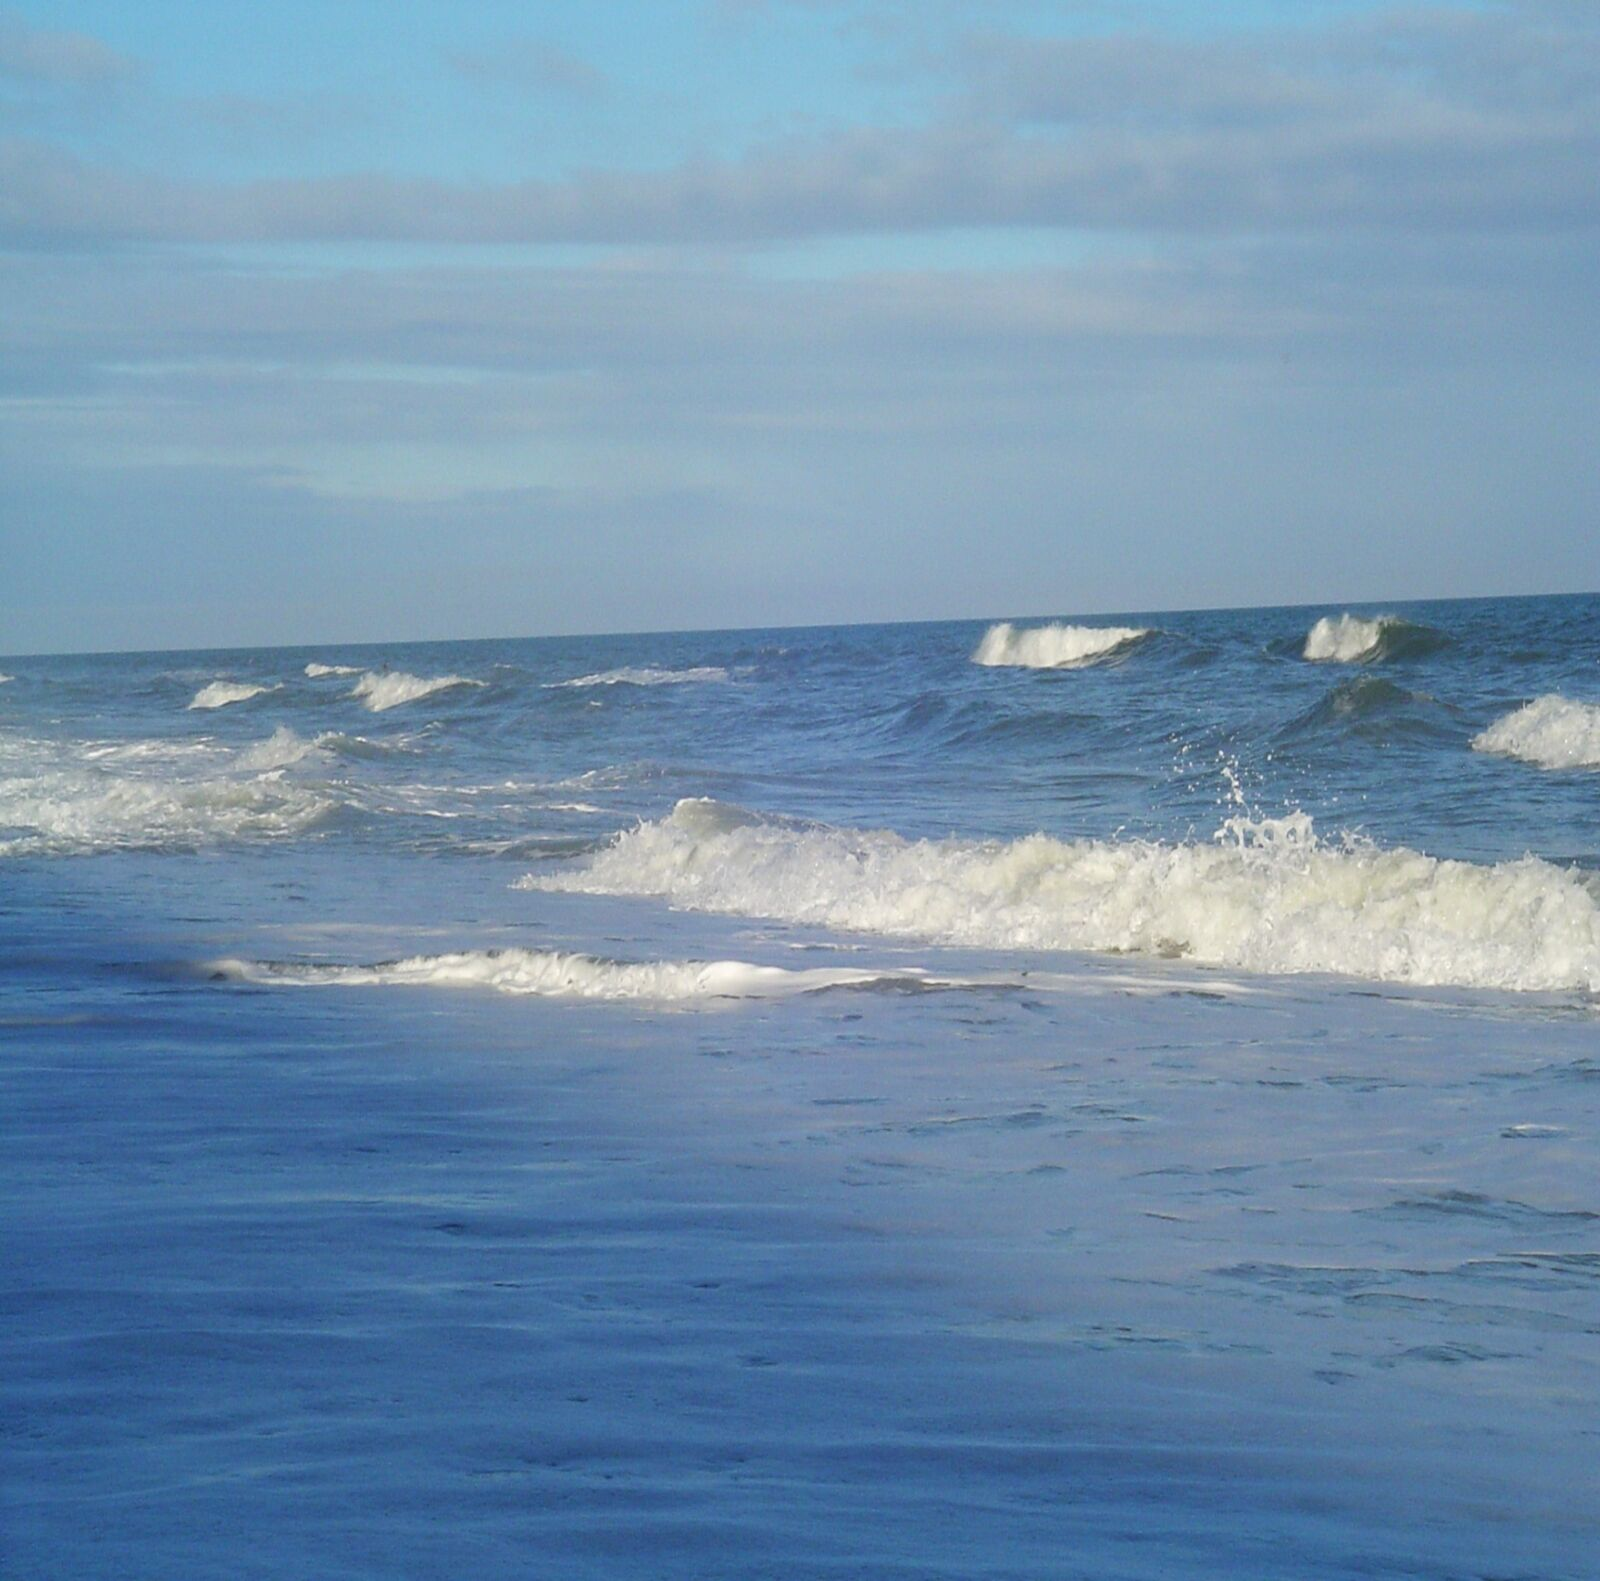 Wyndham Ocean Boulevard, Sept 8-13, 3B, Myrtle Beach, SC, Other Dates Available - $672.00